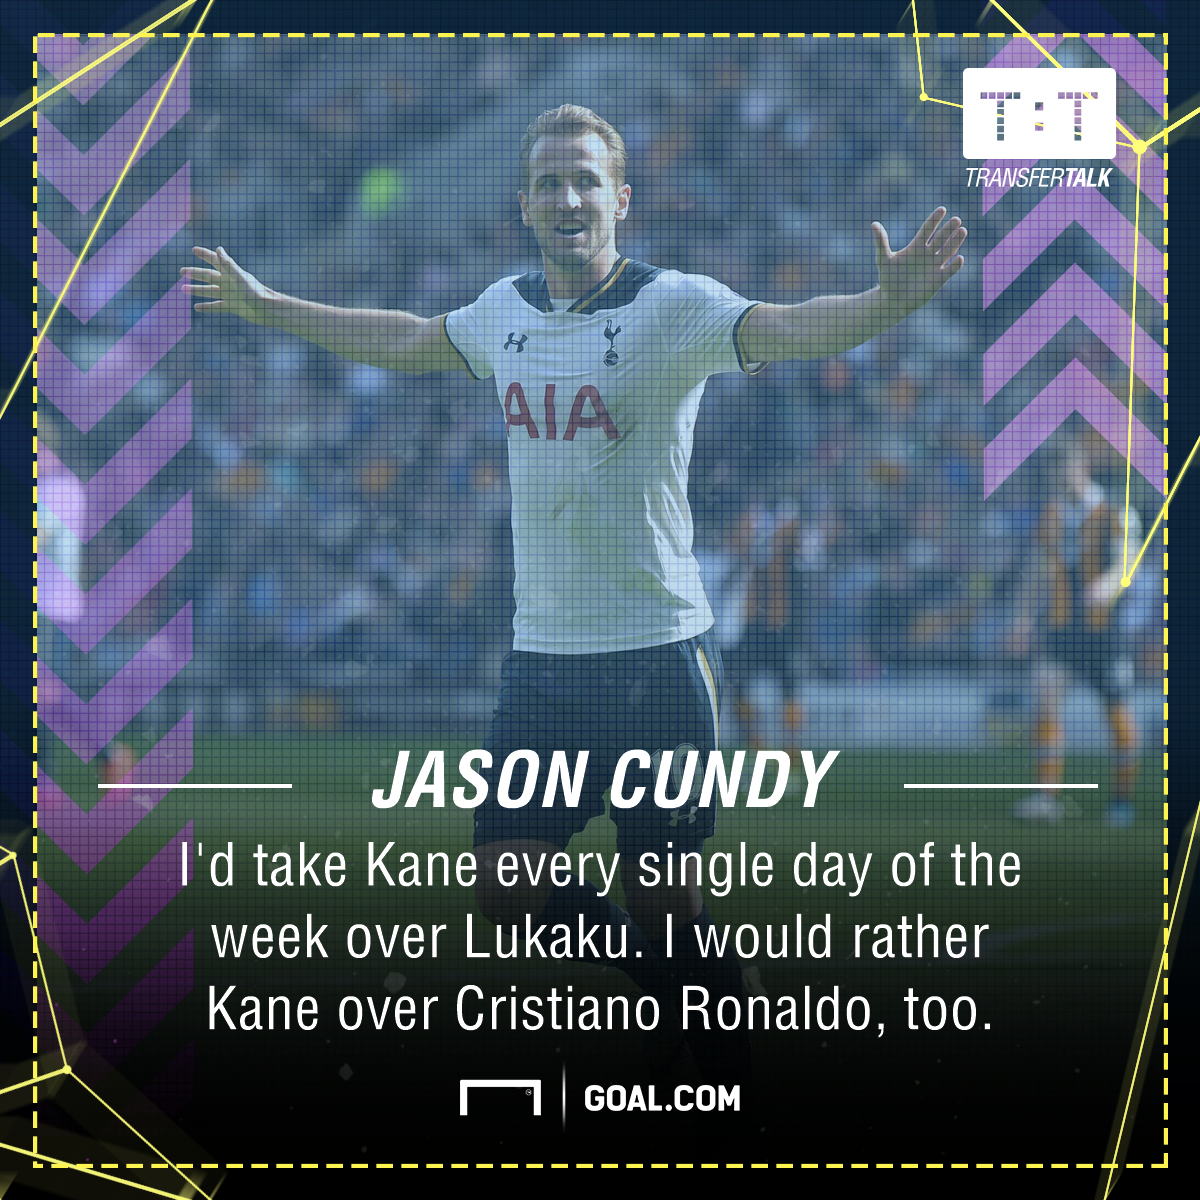 Harry Kane Romelu Lukaku Cristiano Ronaldo Jason Cundy